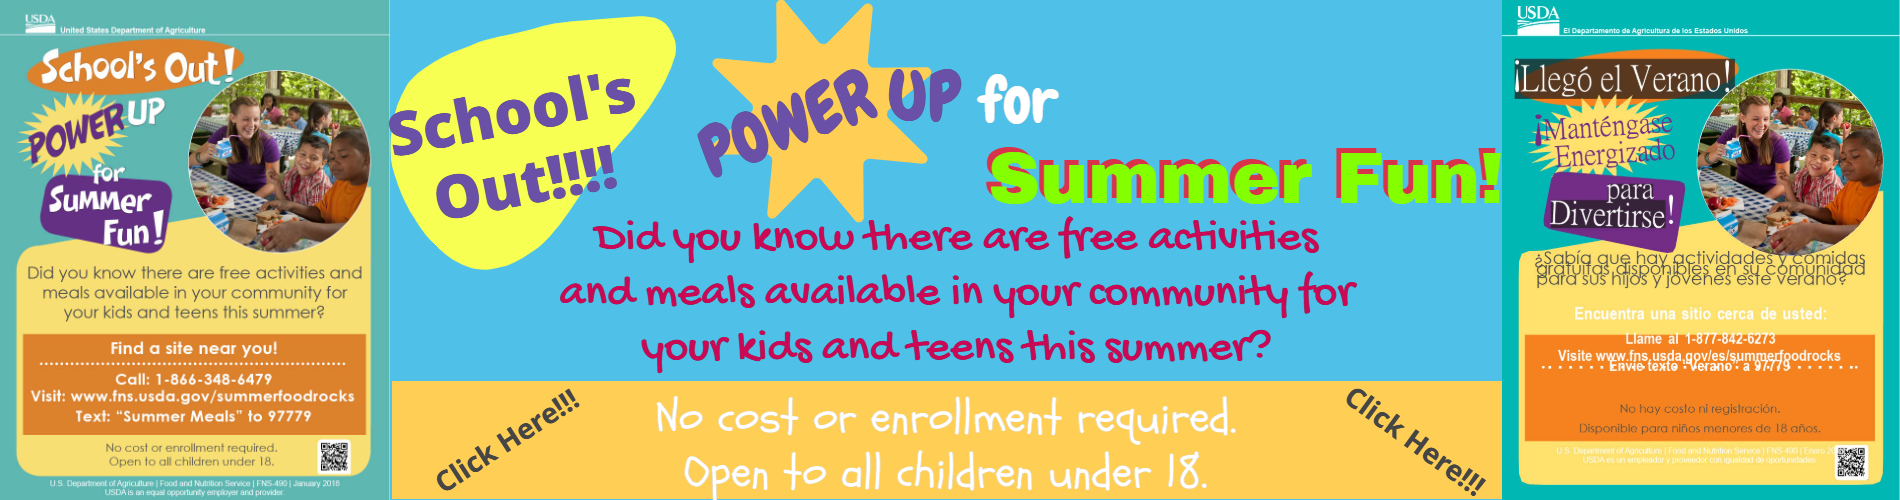 USDA Summer Fun Announcement